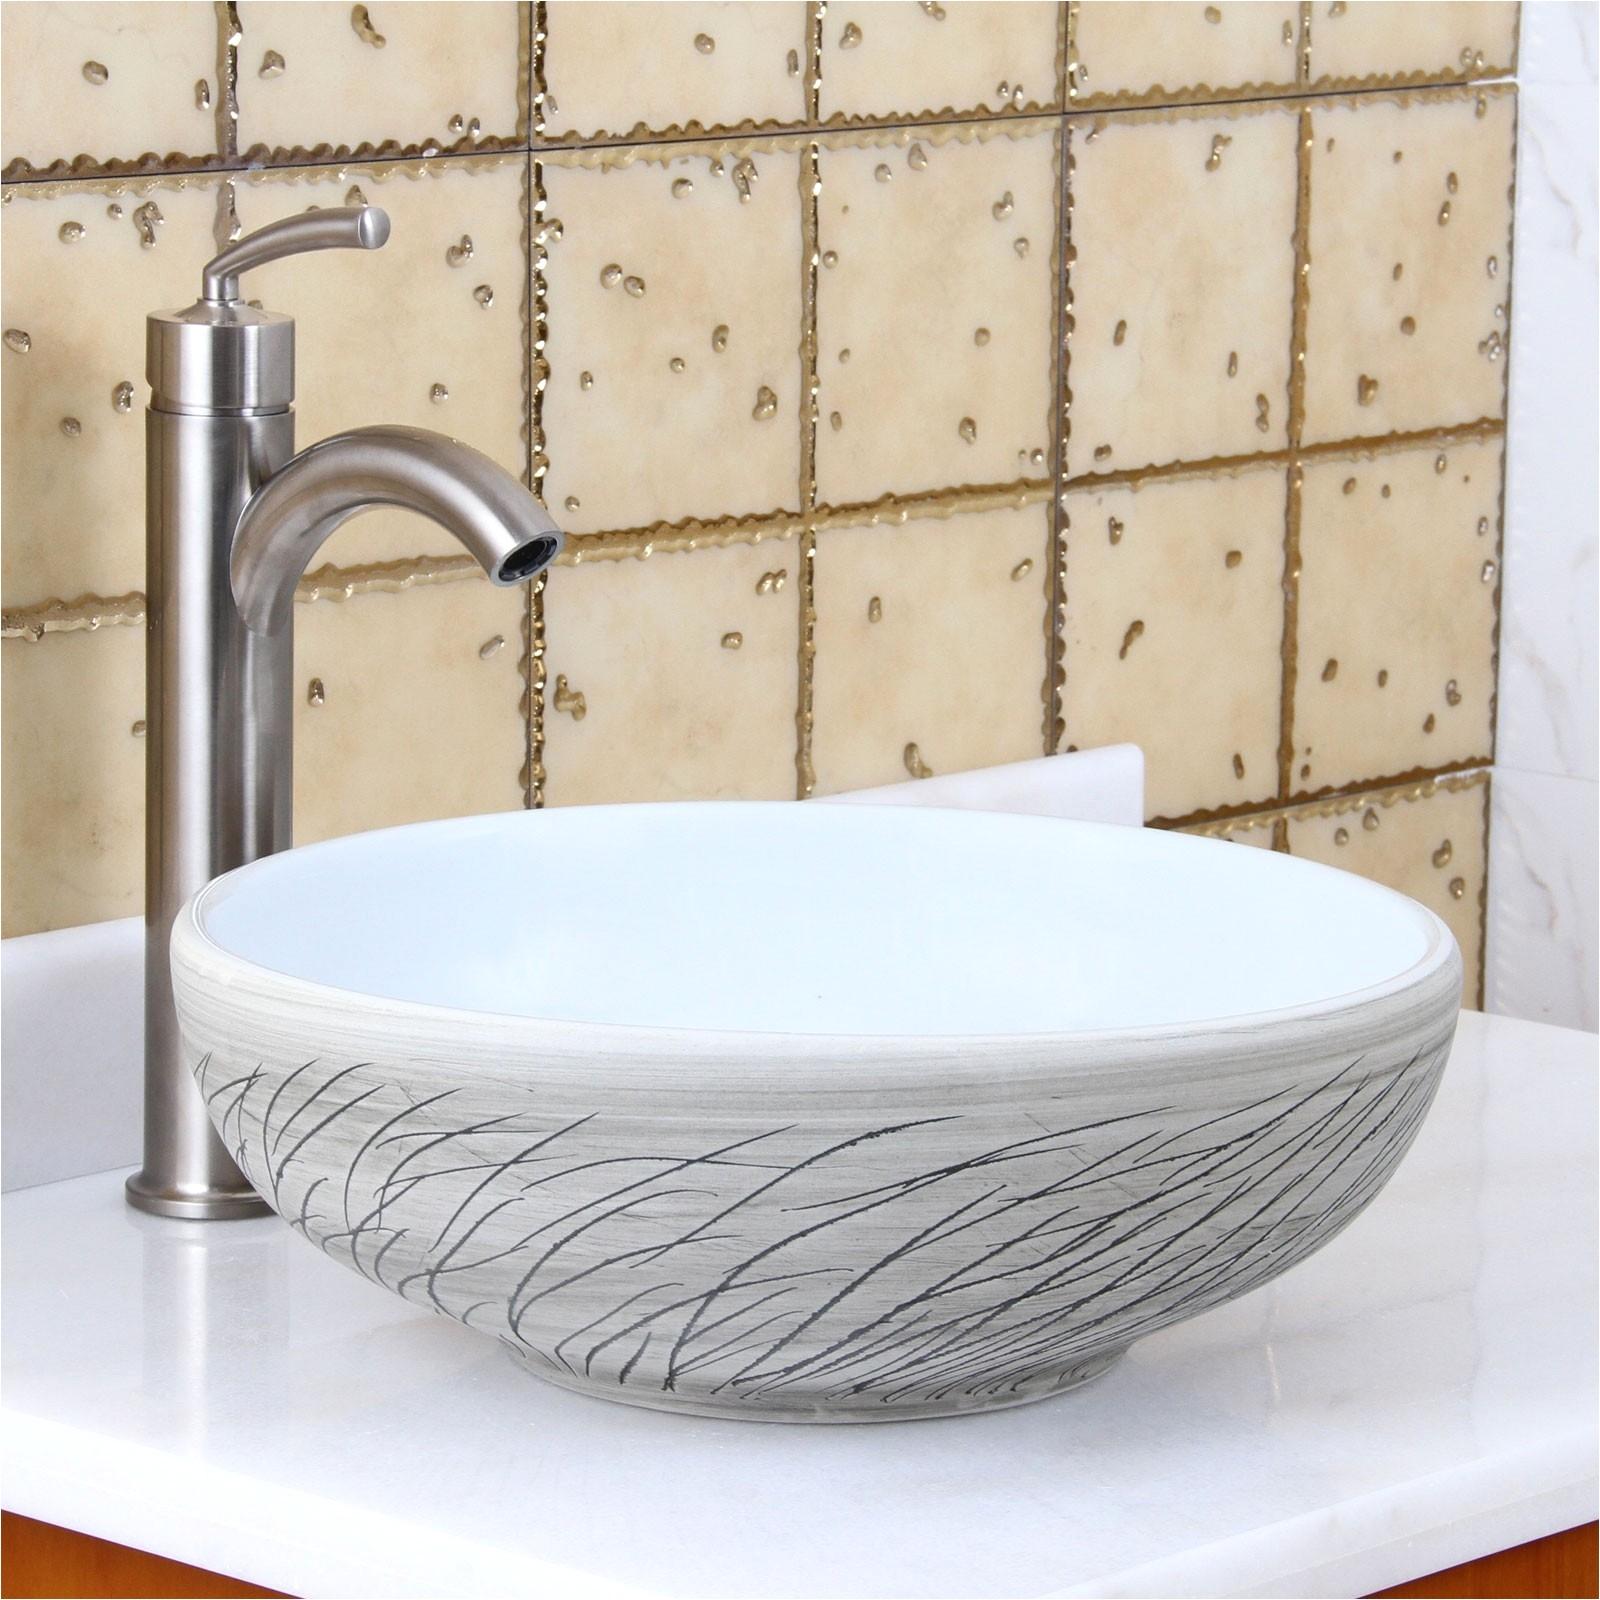 exceptional luxury bathroom shower light new h sink install bathroom i 0d design